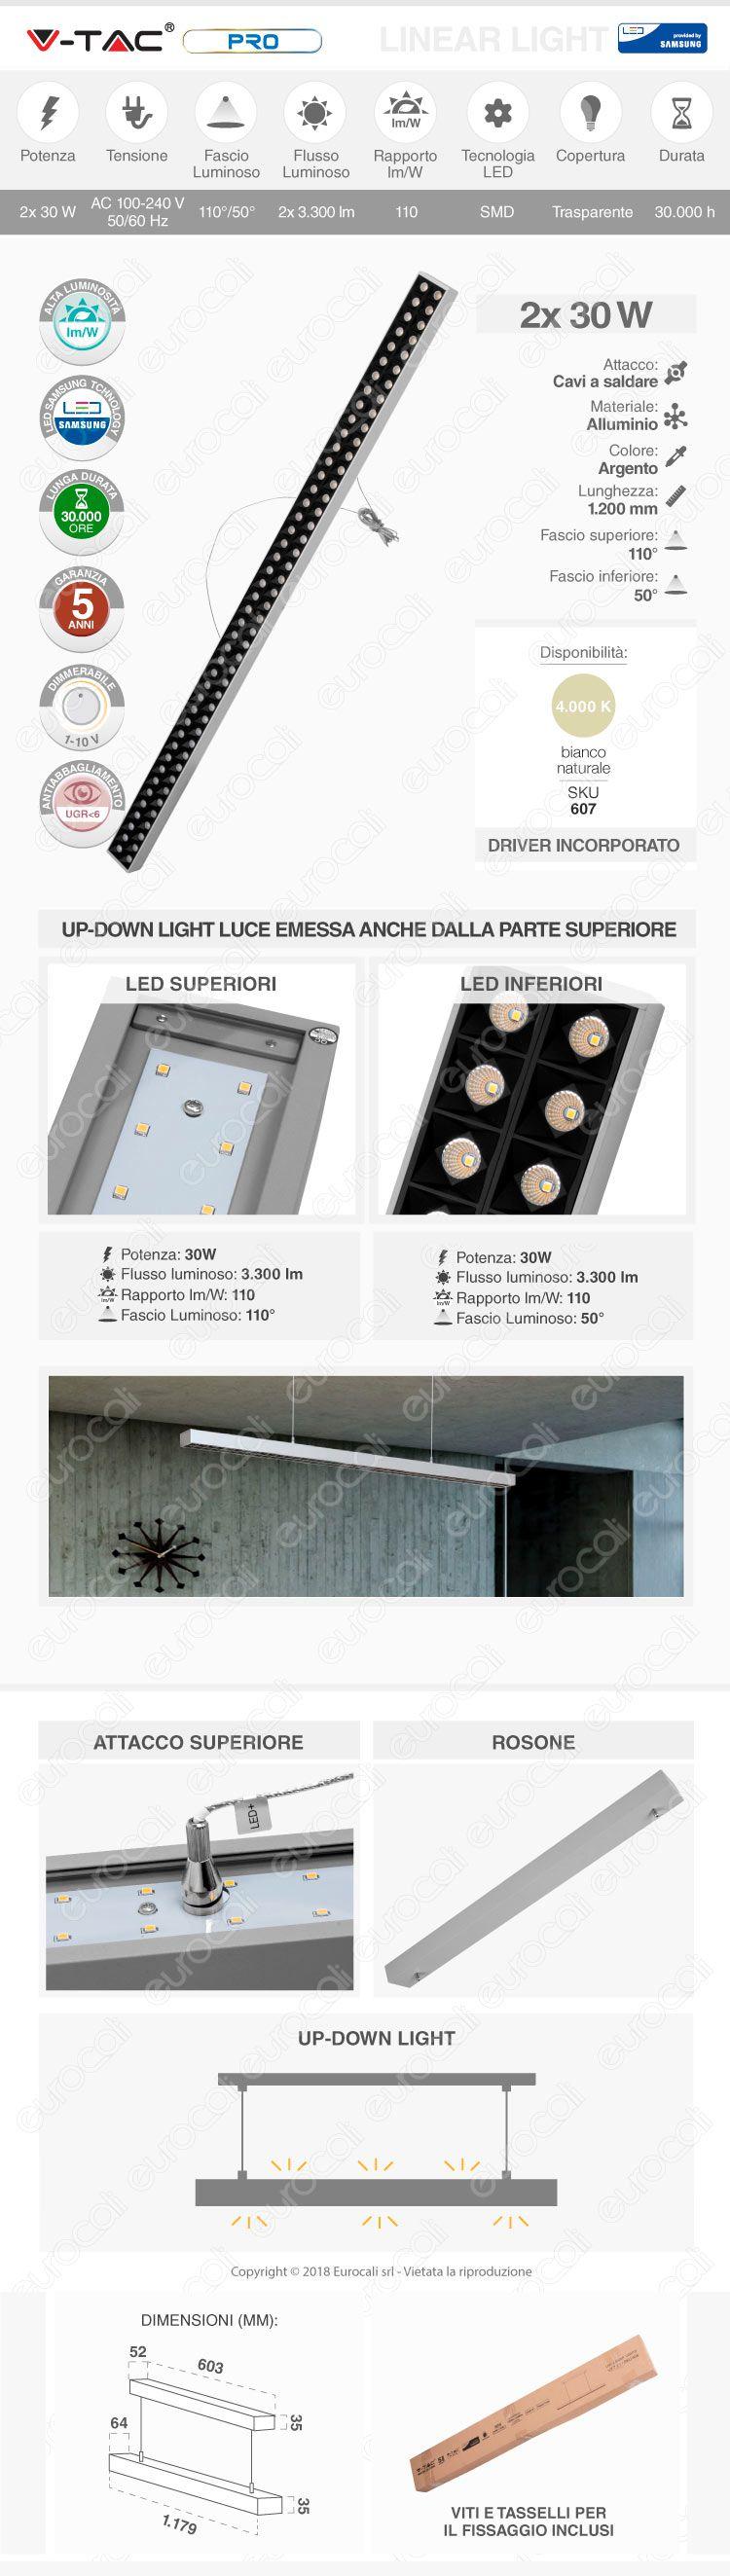 V-Tac PRO VT-7-61 Lampada LED a Sospensione Linear Light 60W Chip Samsung Silver Body Dimmerabile